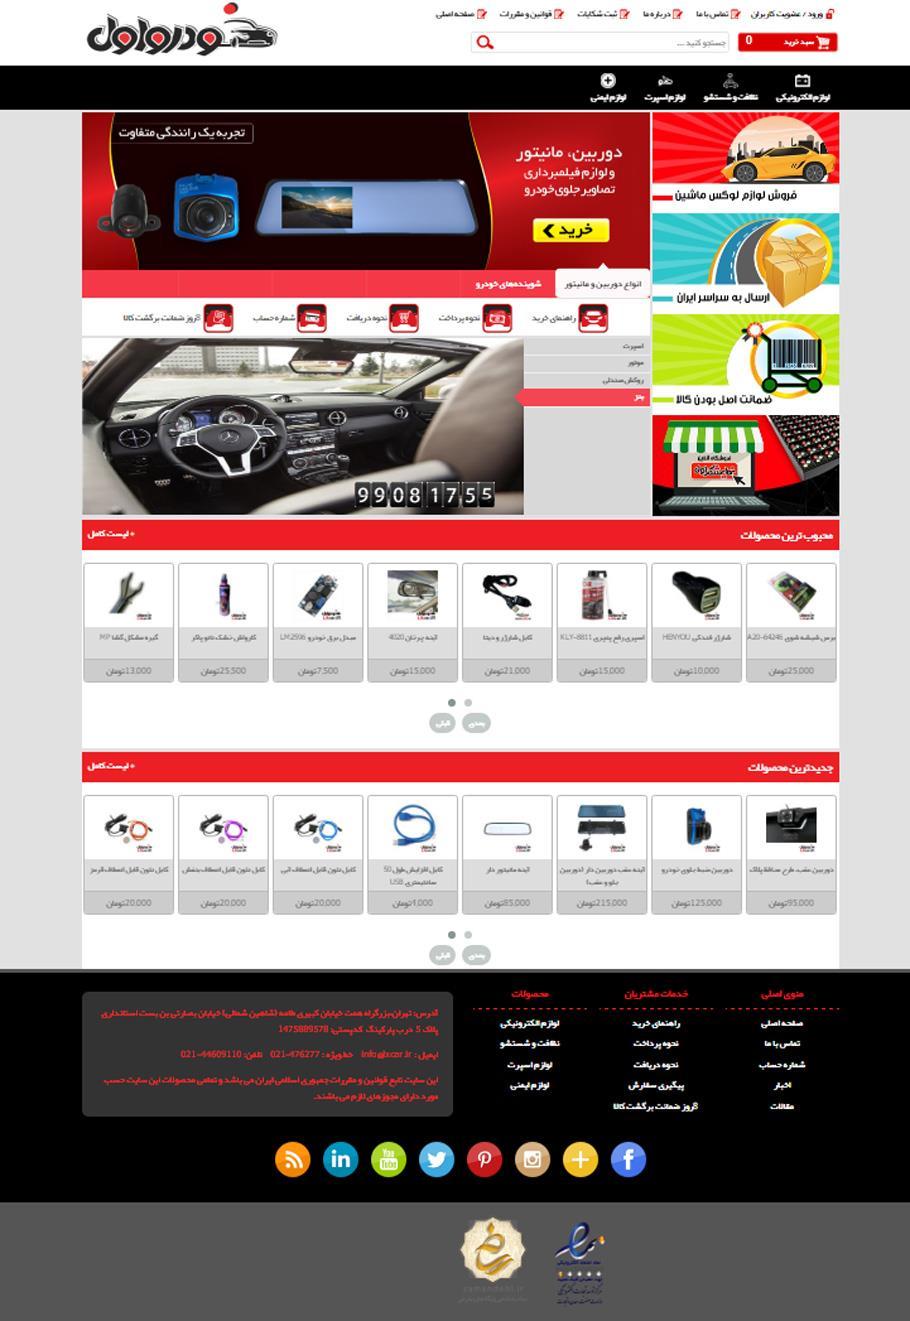 طراحی سایت خودرو | طراحی سایت خودرو سازان | طراحی سایت فروش خودرو ...طراحی فروشگاه اینترنتی لوازم یدکی خودرو اول